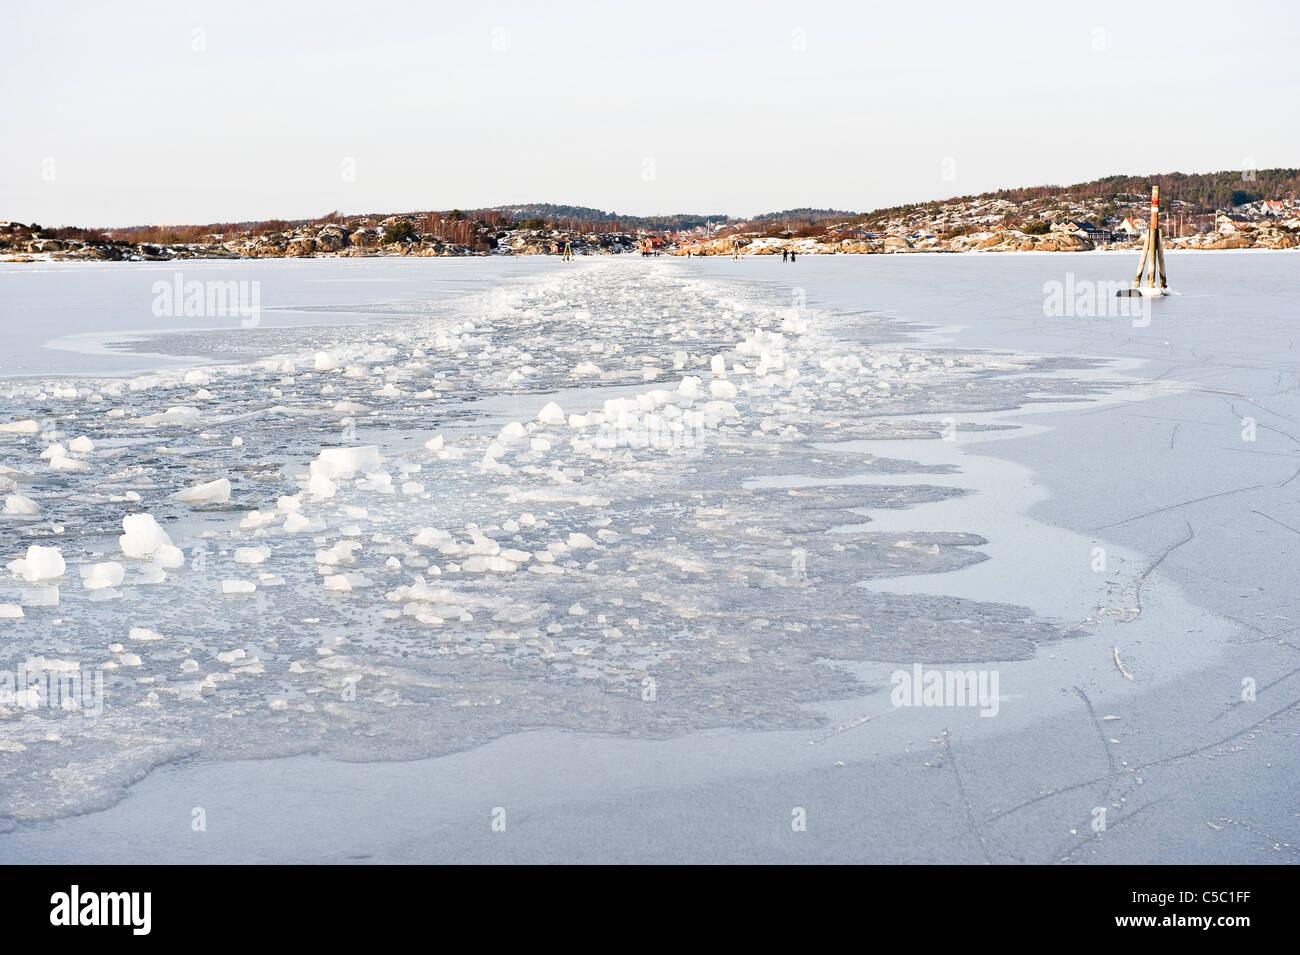 View of frozen icebreaking in the Kattegat against sky, Sweden - Stock Image